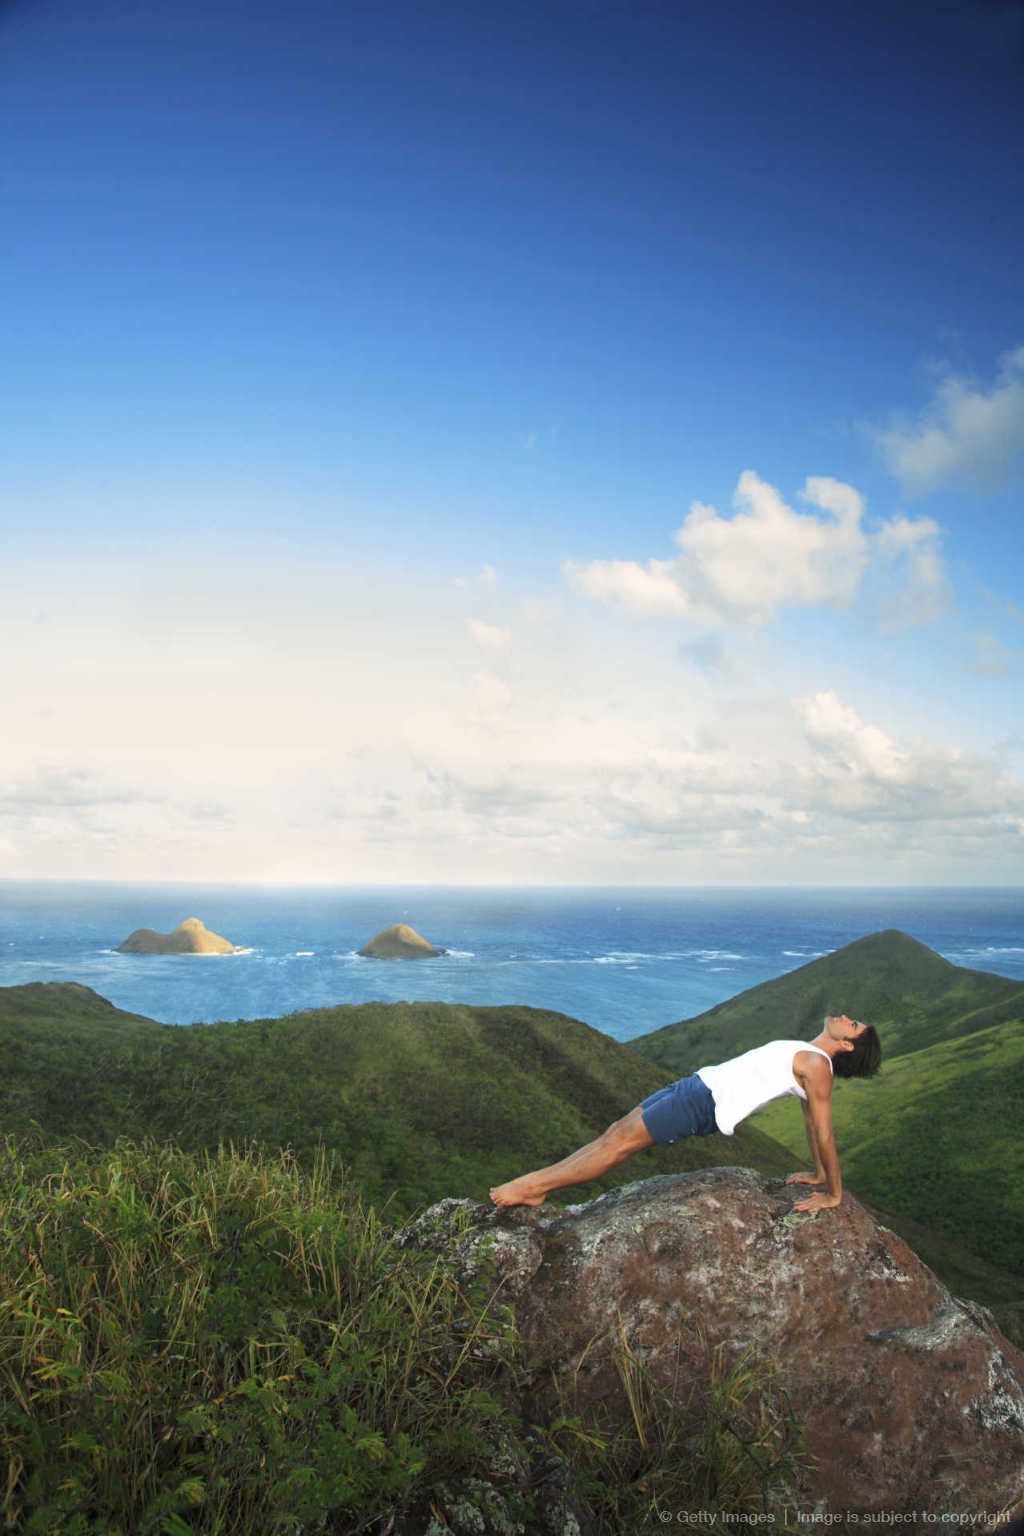 Hawaii, Oahu, Lanikai, Male hiker admiring view of doing